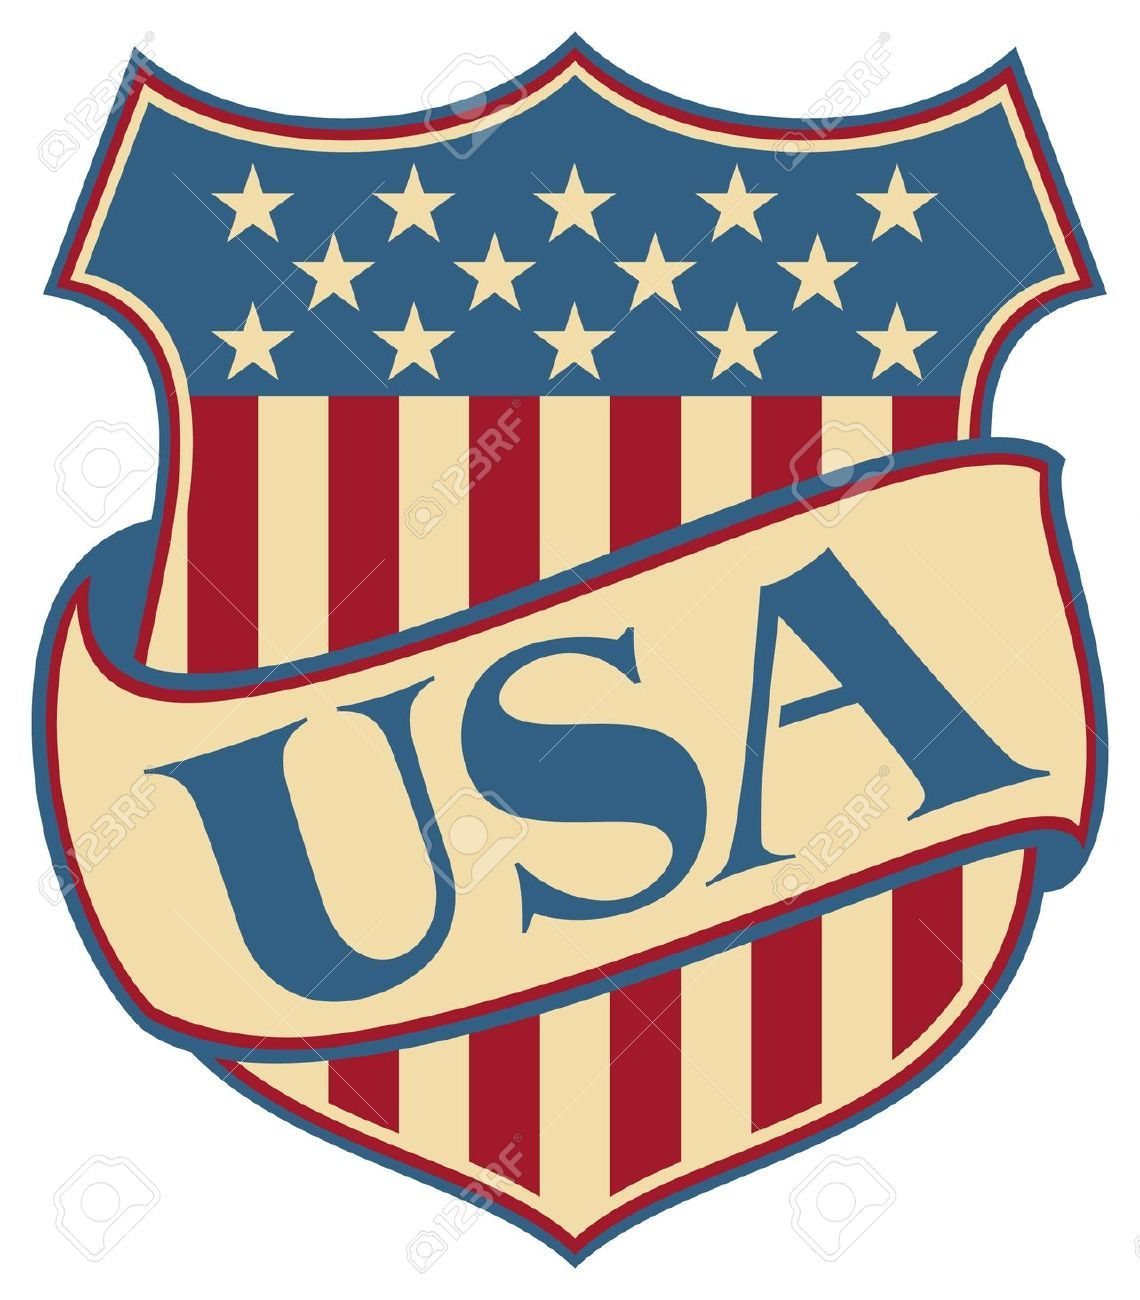 United States Of America Shield Usa American Patriotic Symbol